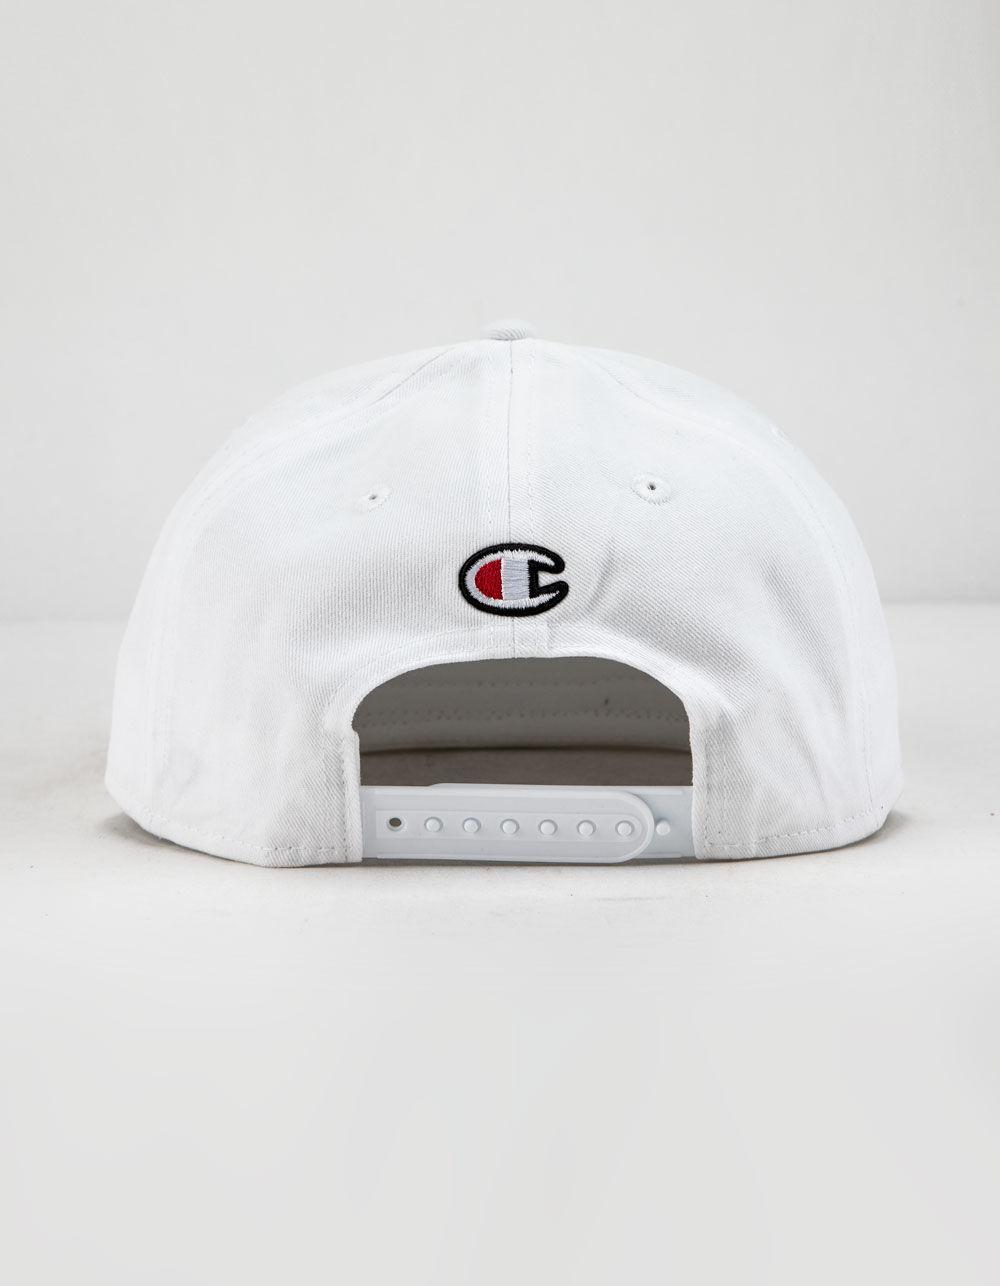 7b0813c8a8258 Champion Bb Script White Snapback Hat in White for Men - Lyst